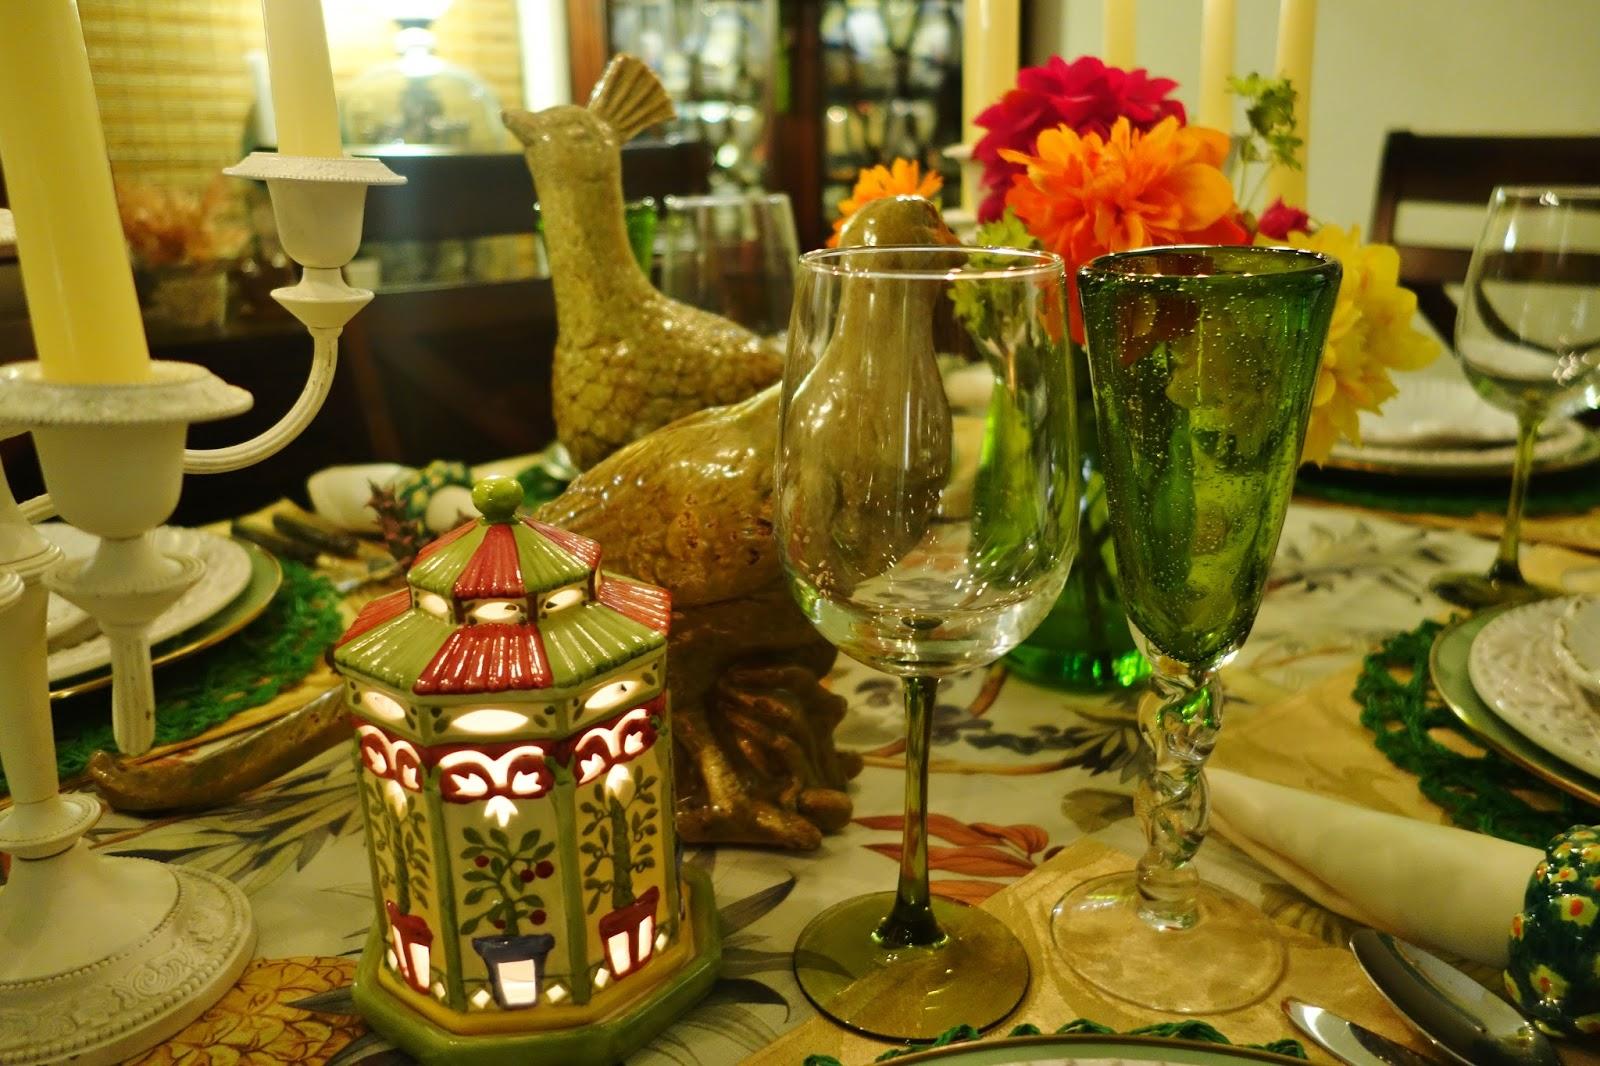 Christine S Home And Travel Adventures White Turkey Salad